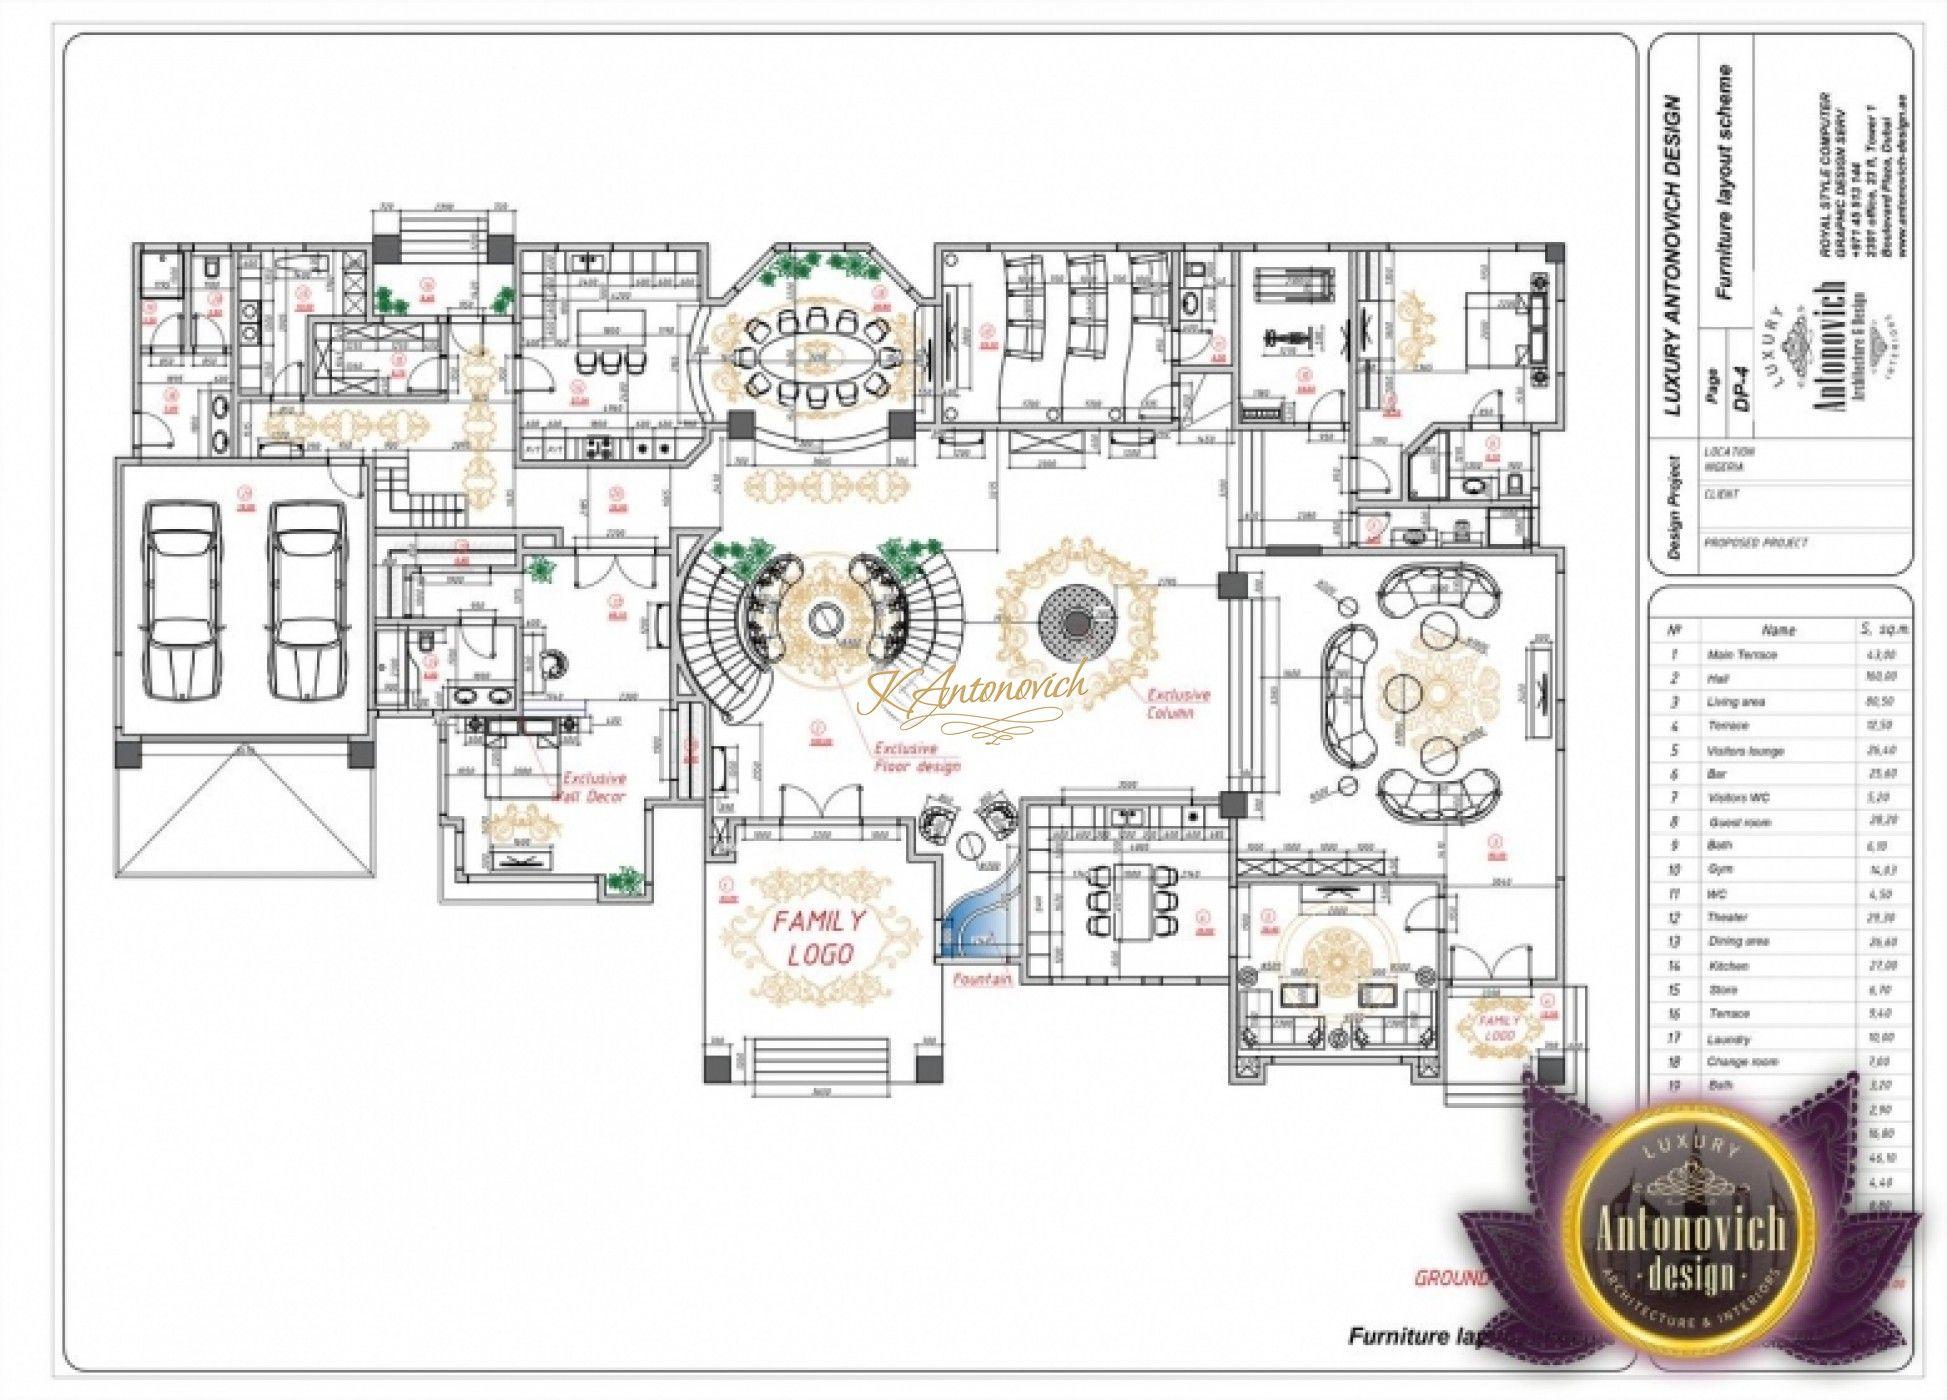 Luxury House Plan Nigeria Luxury House Plans Luxury House Designs Luxury Floor Plans